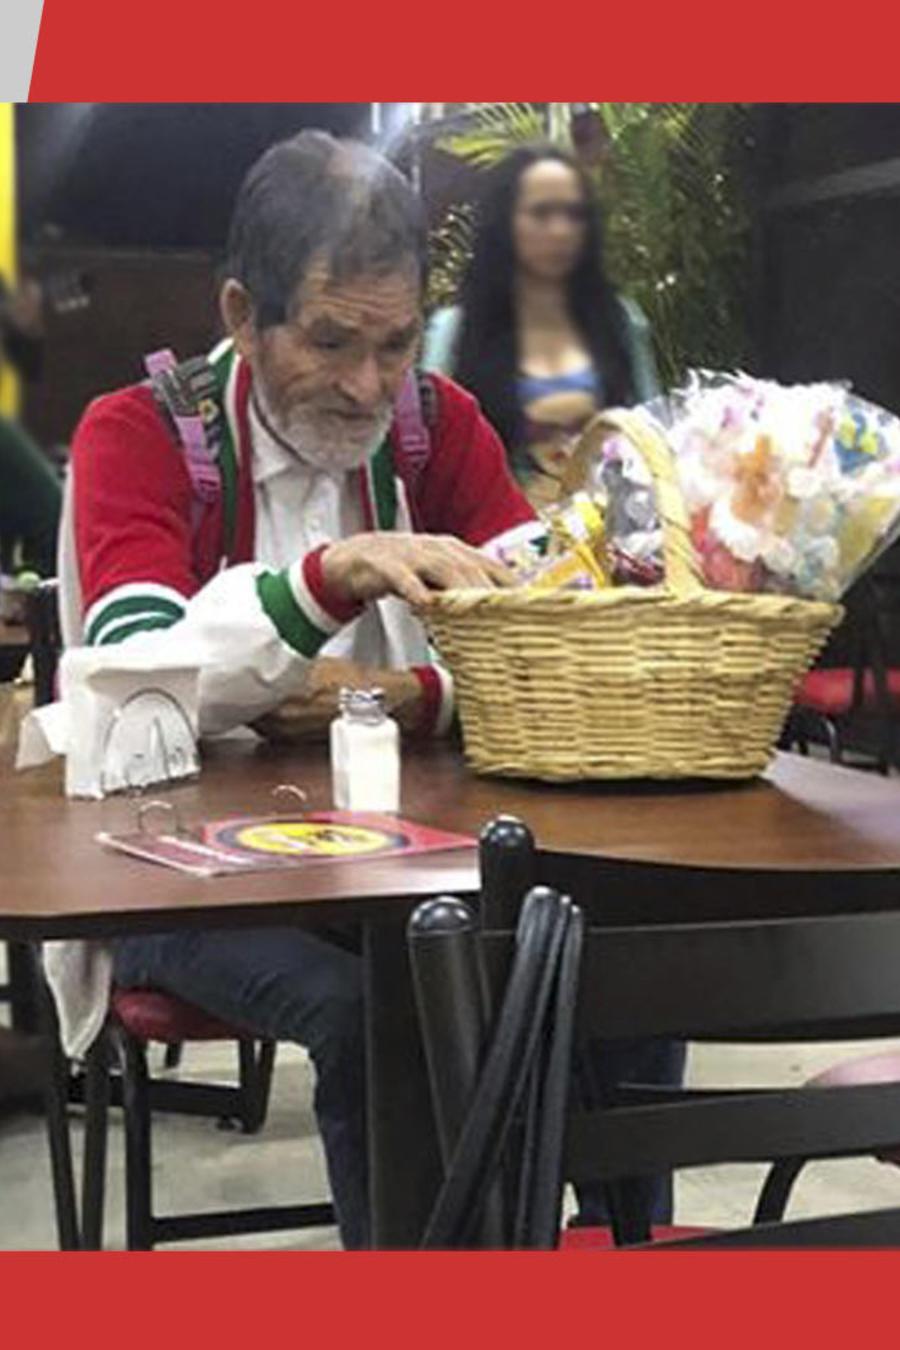 Niño compra tacos a viejito